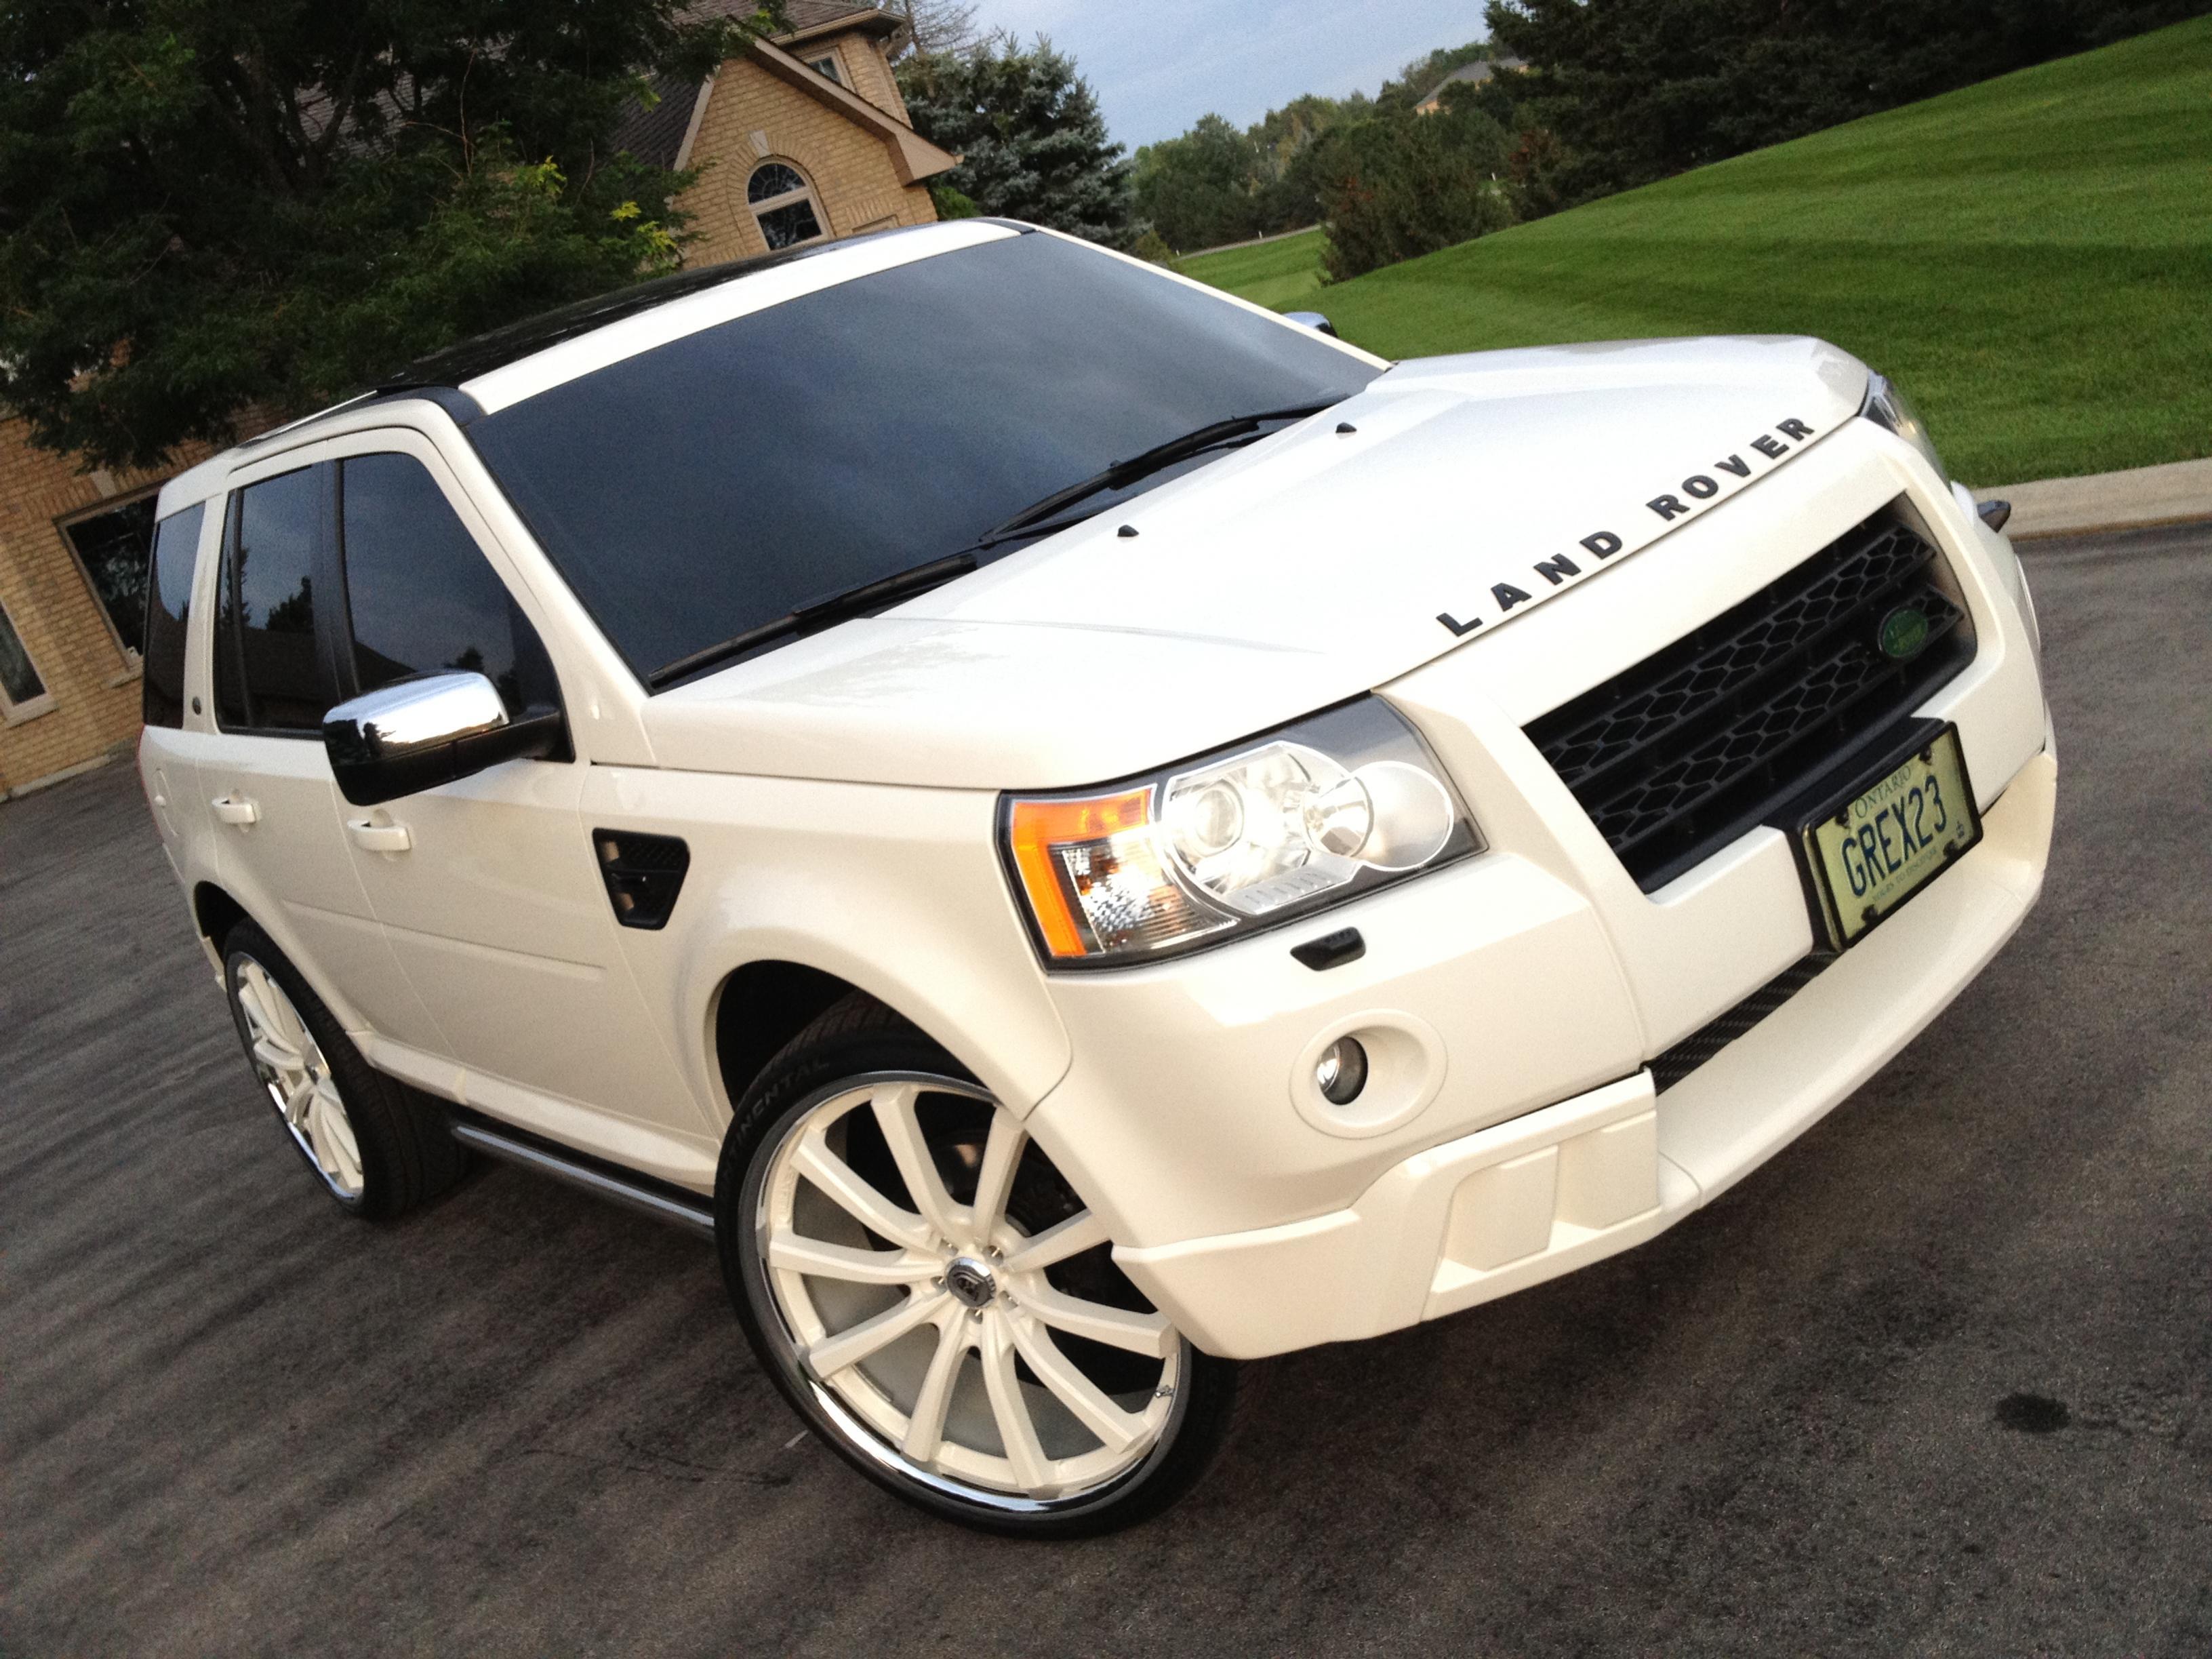 Range Rover Evoke >> 24 Inch Lexani CVX-55 Rims with Continental DWS EC Tires - FOR SALE